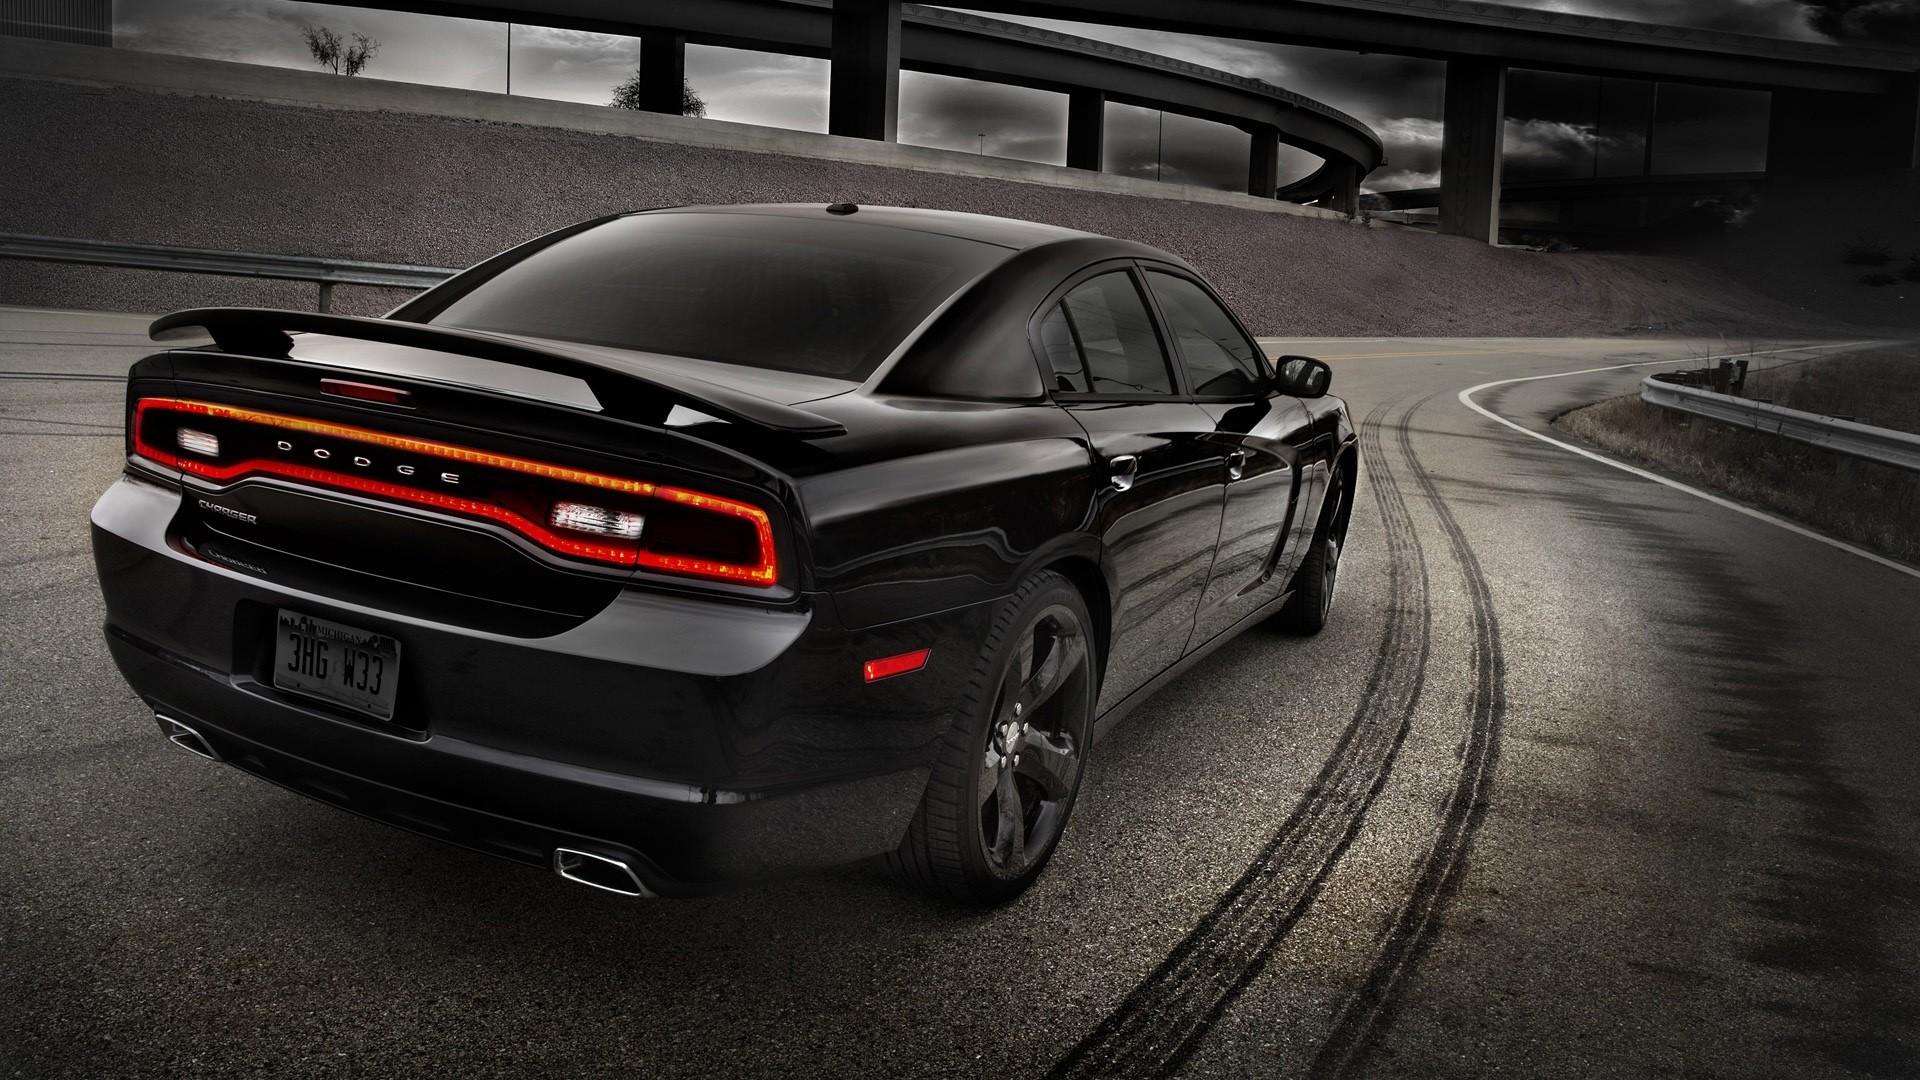 Dodge Charger SRT / SRT Hellcat Cars Wallpaper